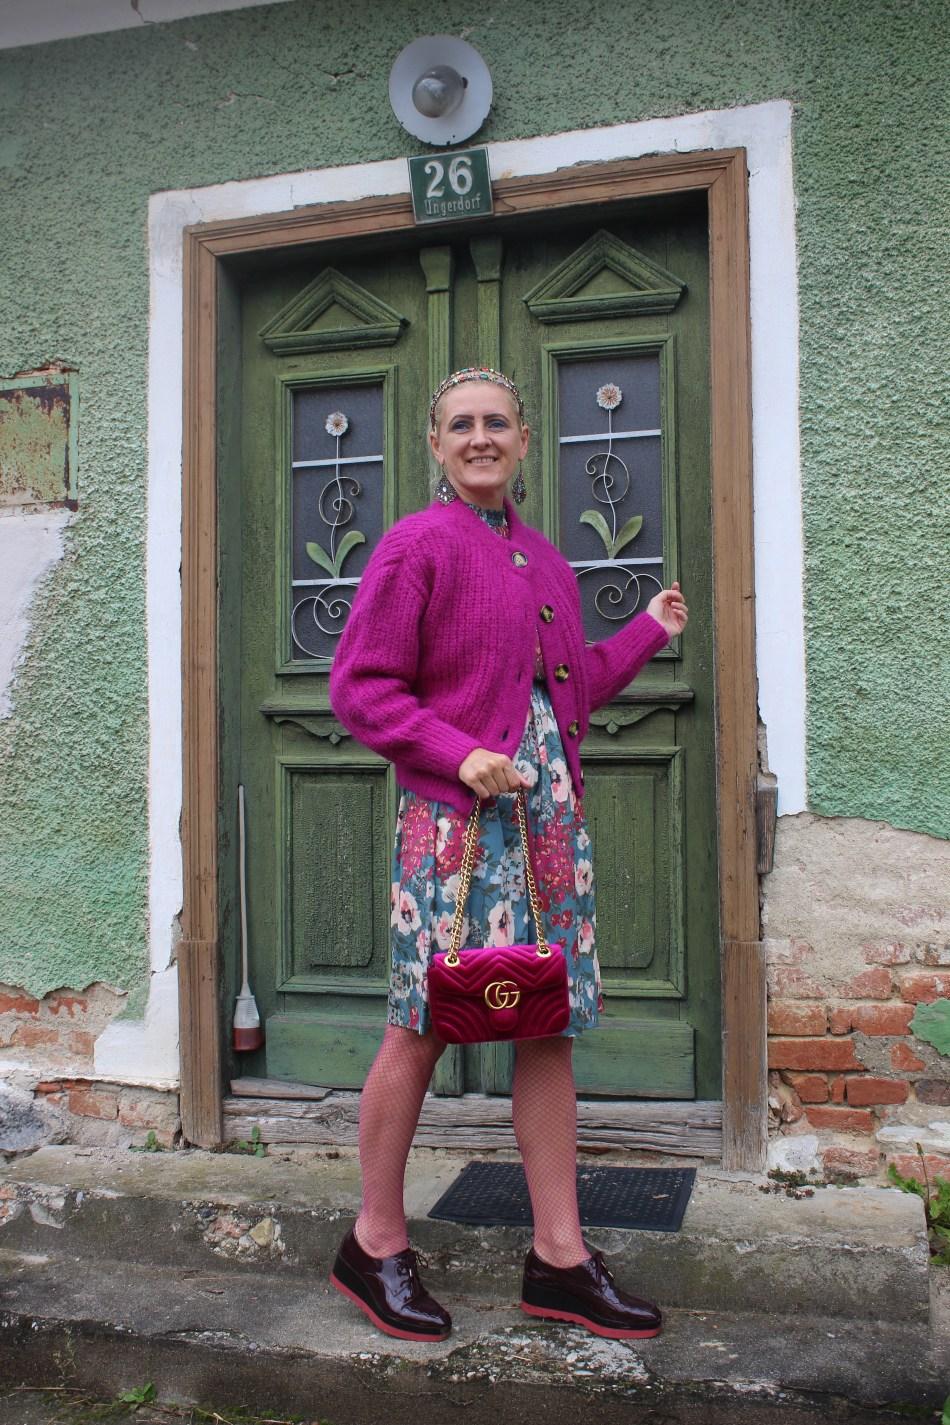 Cardigan-Floralprint-Gucci-Velvet-Bag-carrieslifestyle-Tamara-Prutsch